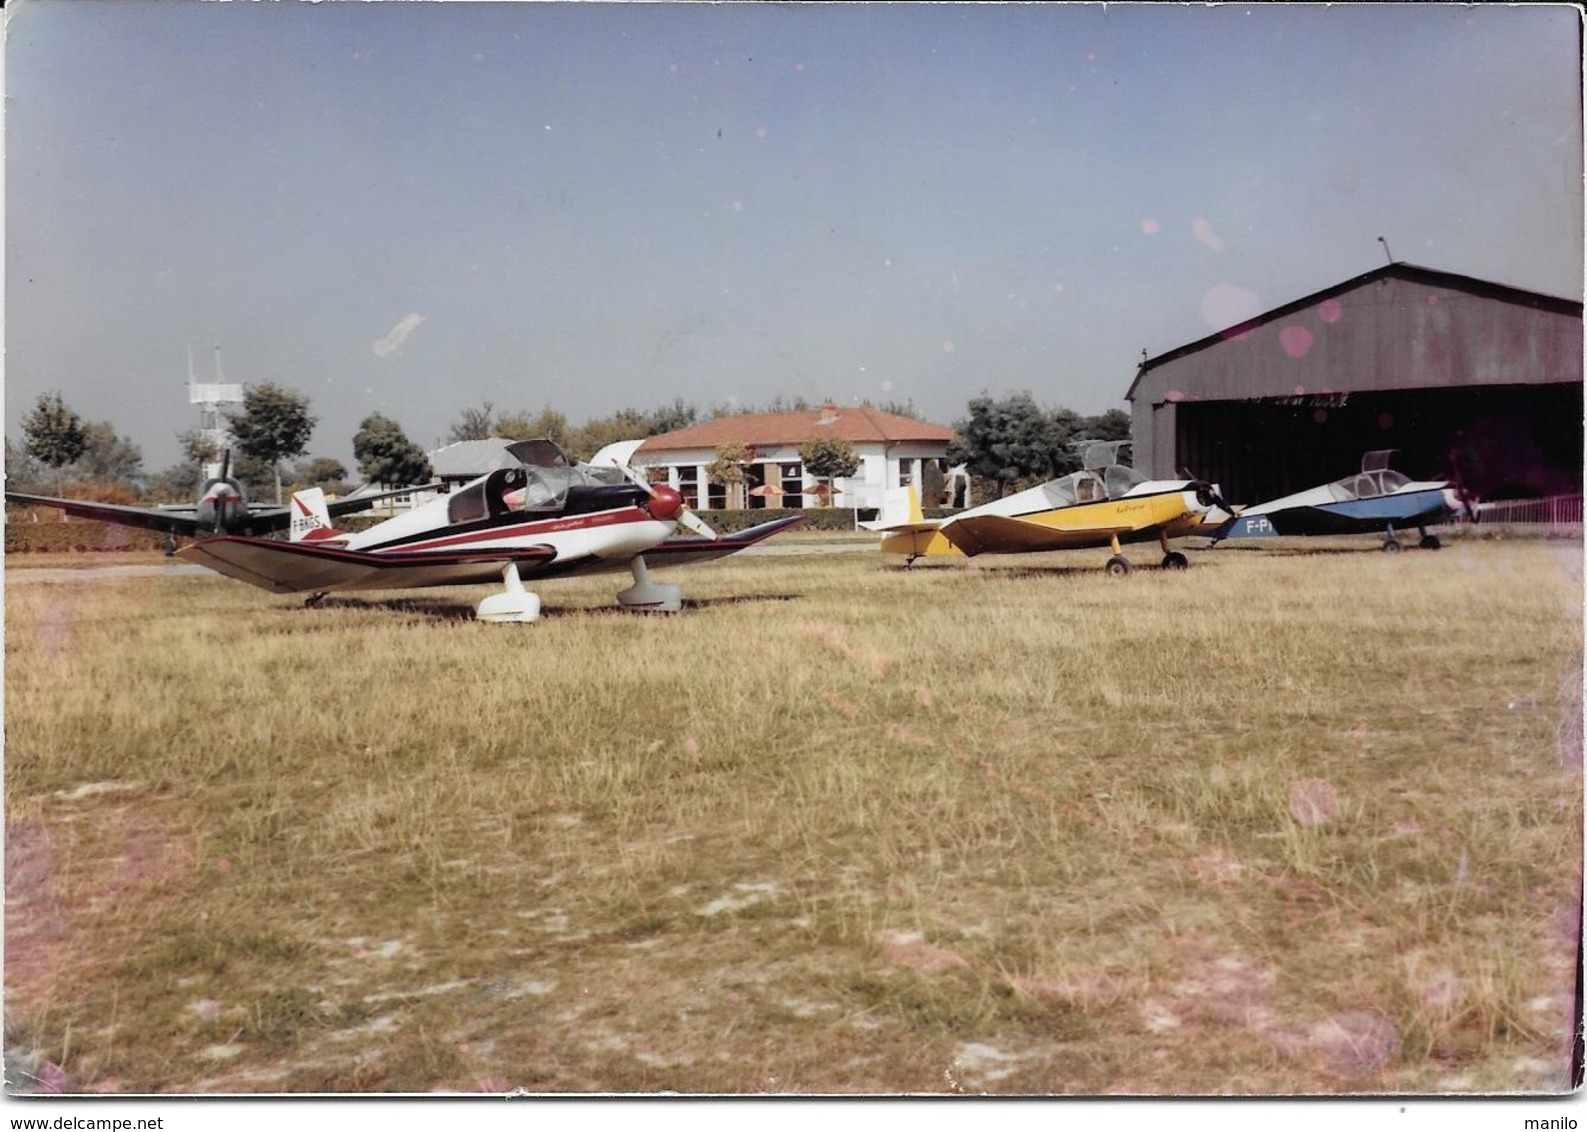 MACON -AERODROME -UN HANGAR, AERO-BAR, APPAREILS DE MESURE METEO, AVIONS Photo Originale 1964-COMBIER CIM Imp à Macon - Aviation